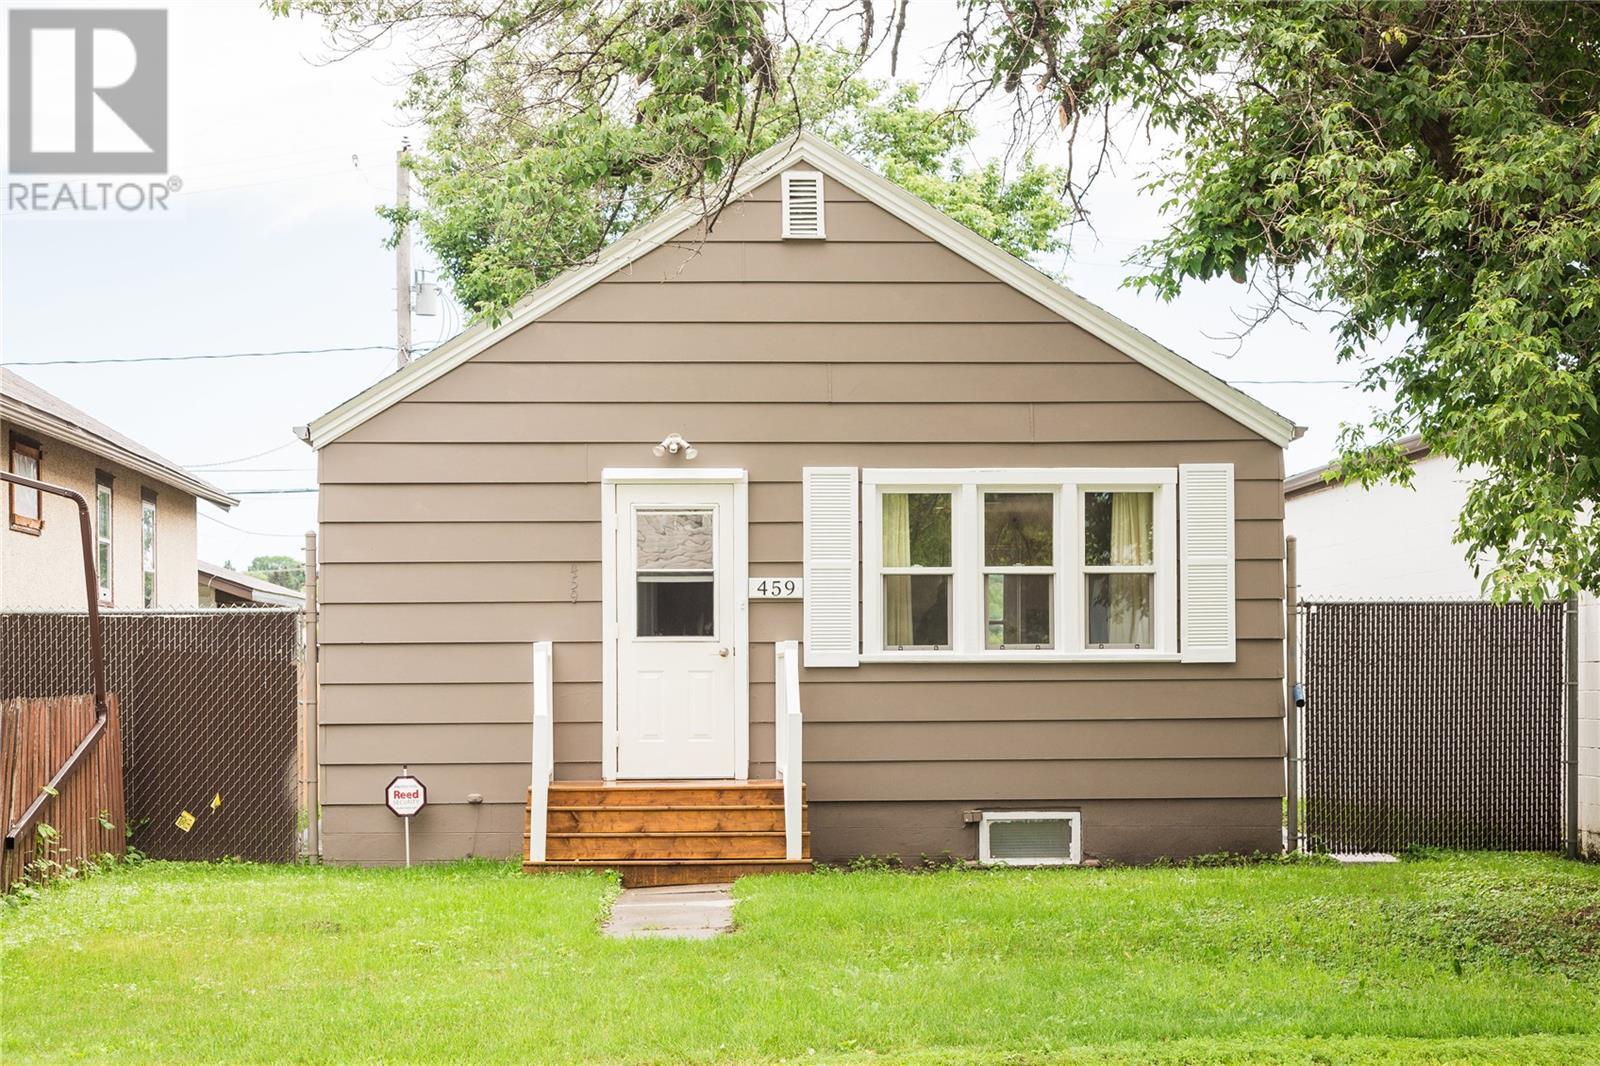 459 13th ST E, prince albert, Saskatchewan